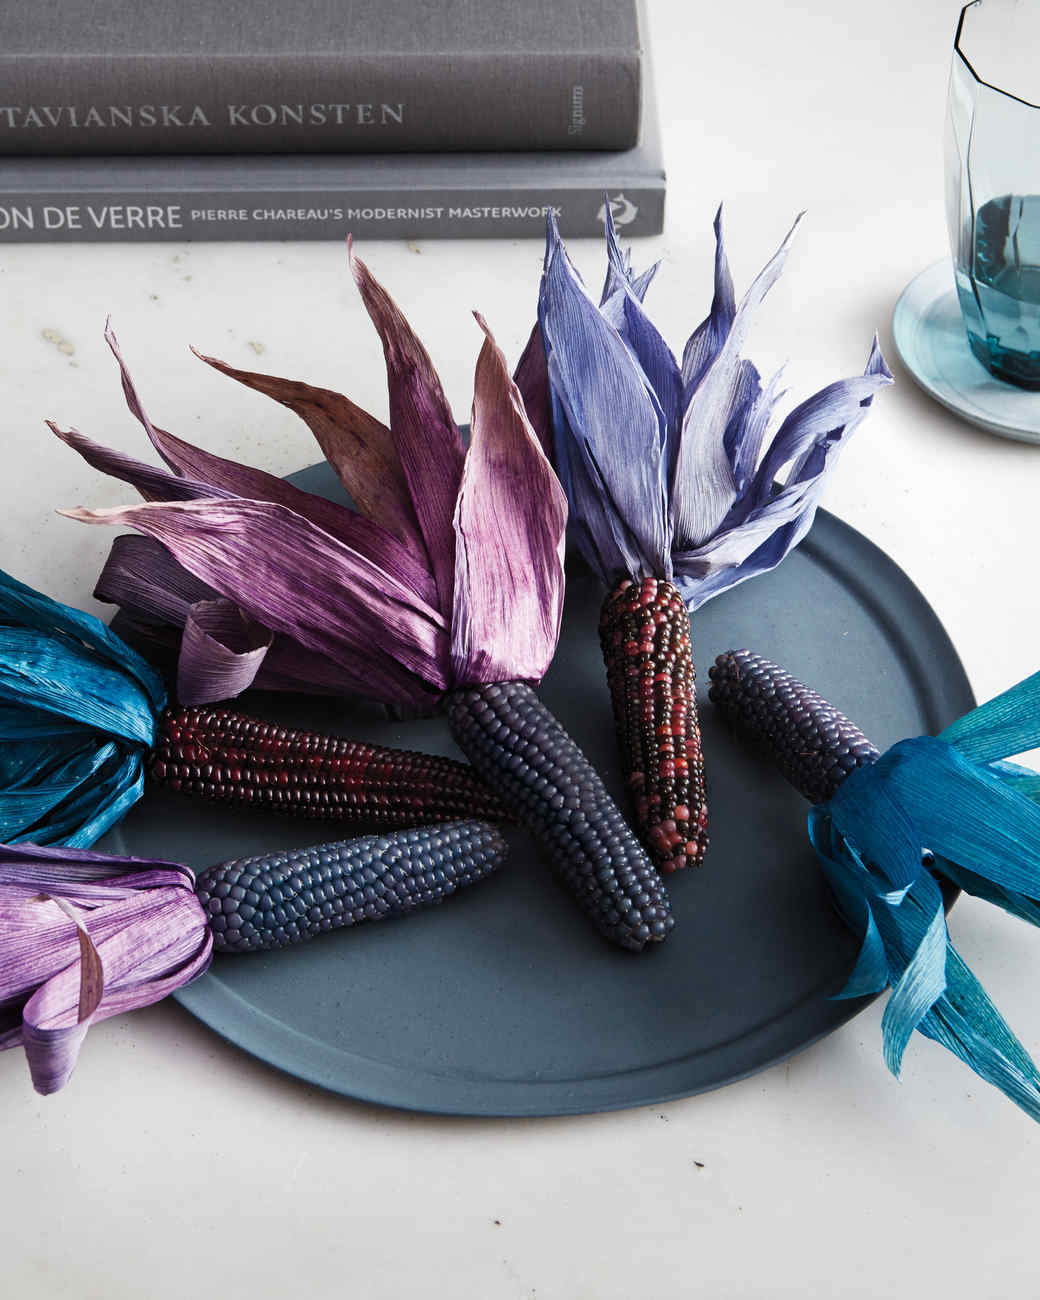 corn-husks-001-d112369.jpg